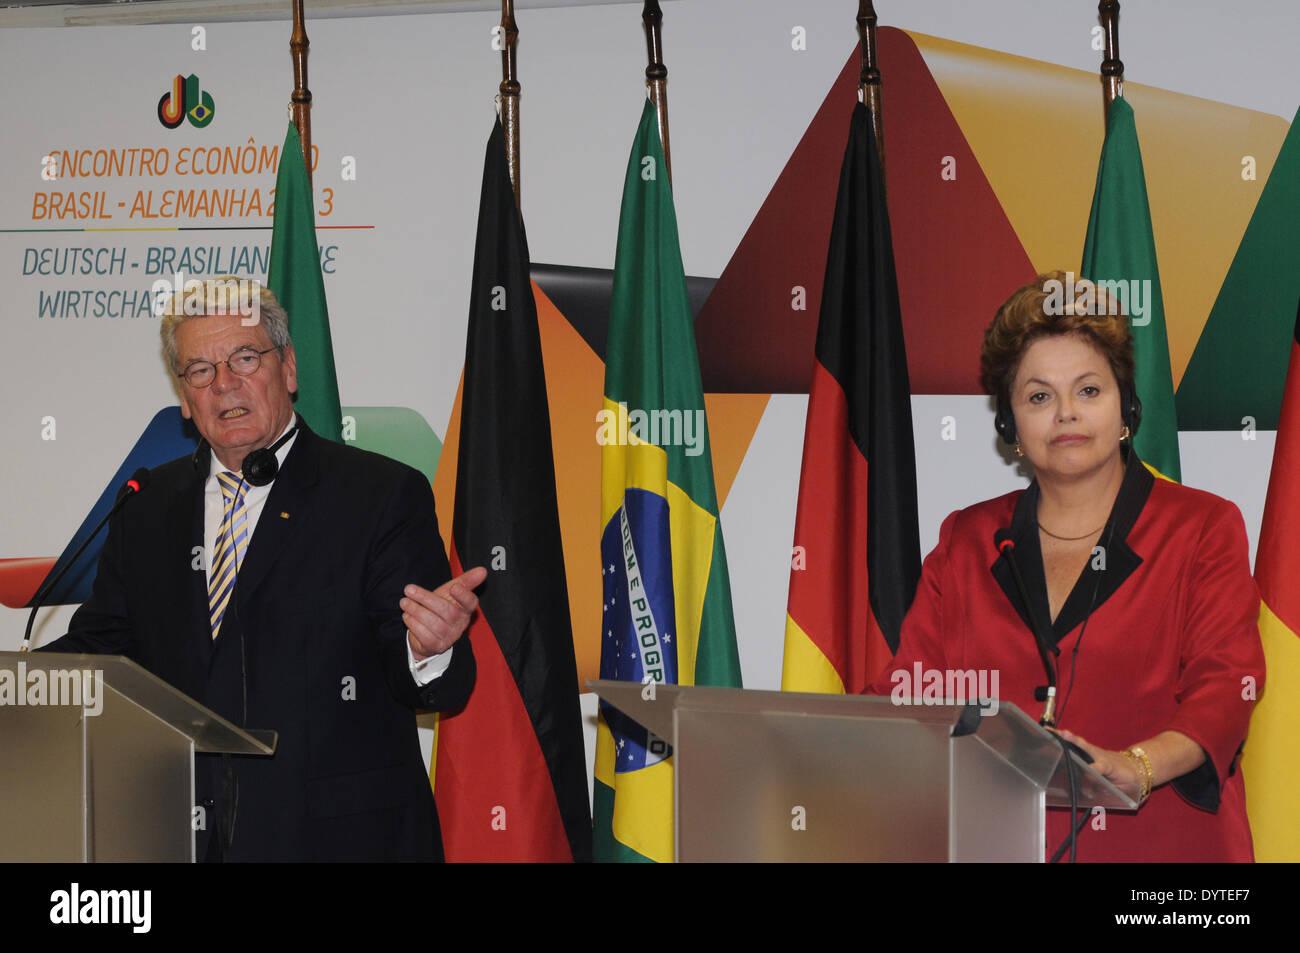 Dilma Rousseff and Joachim Gauck in Sao Paulo - Stock Image